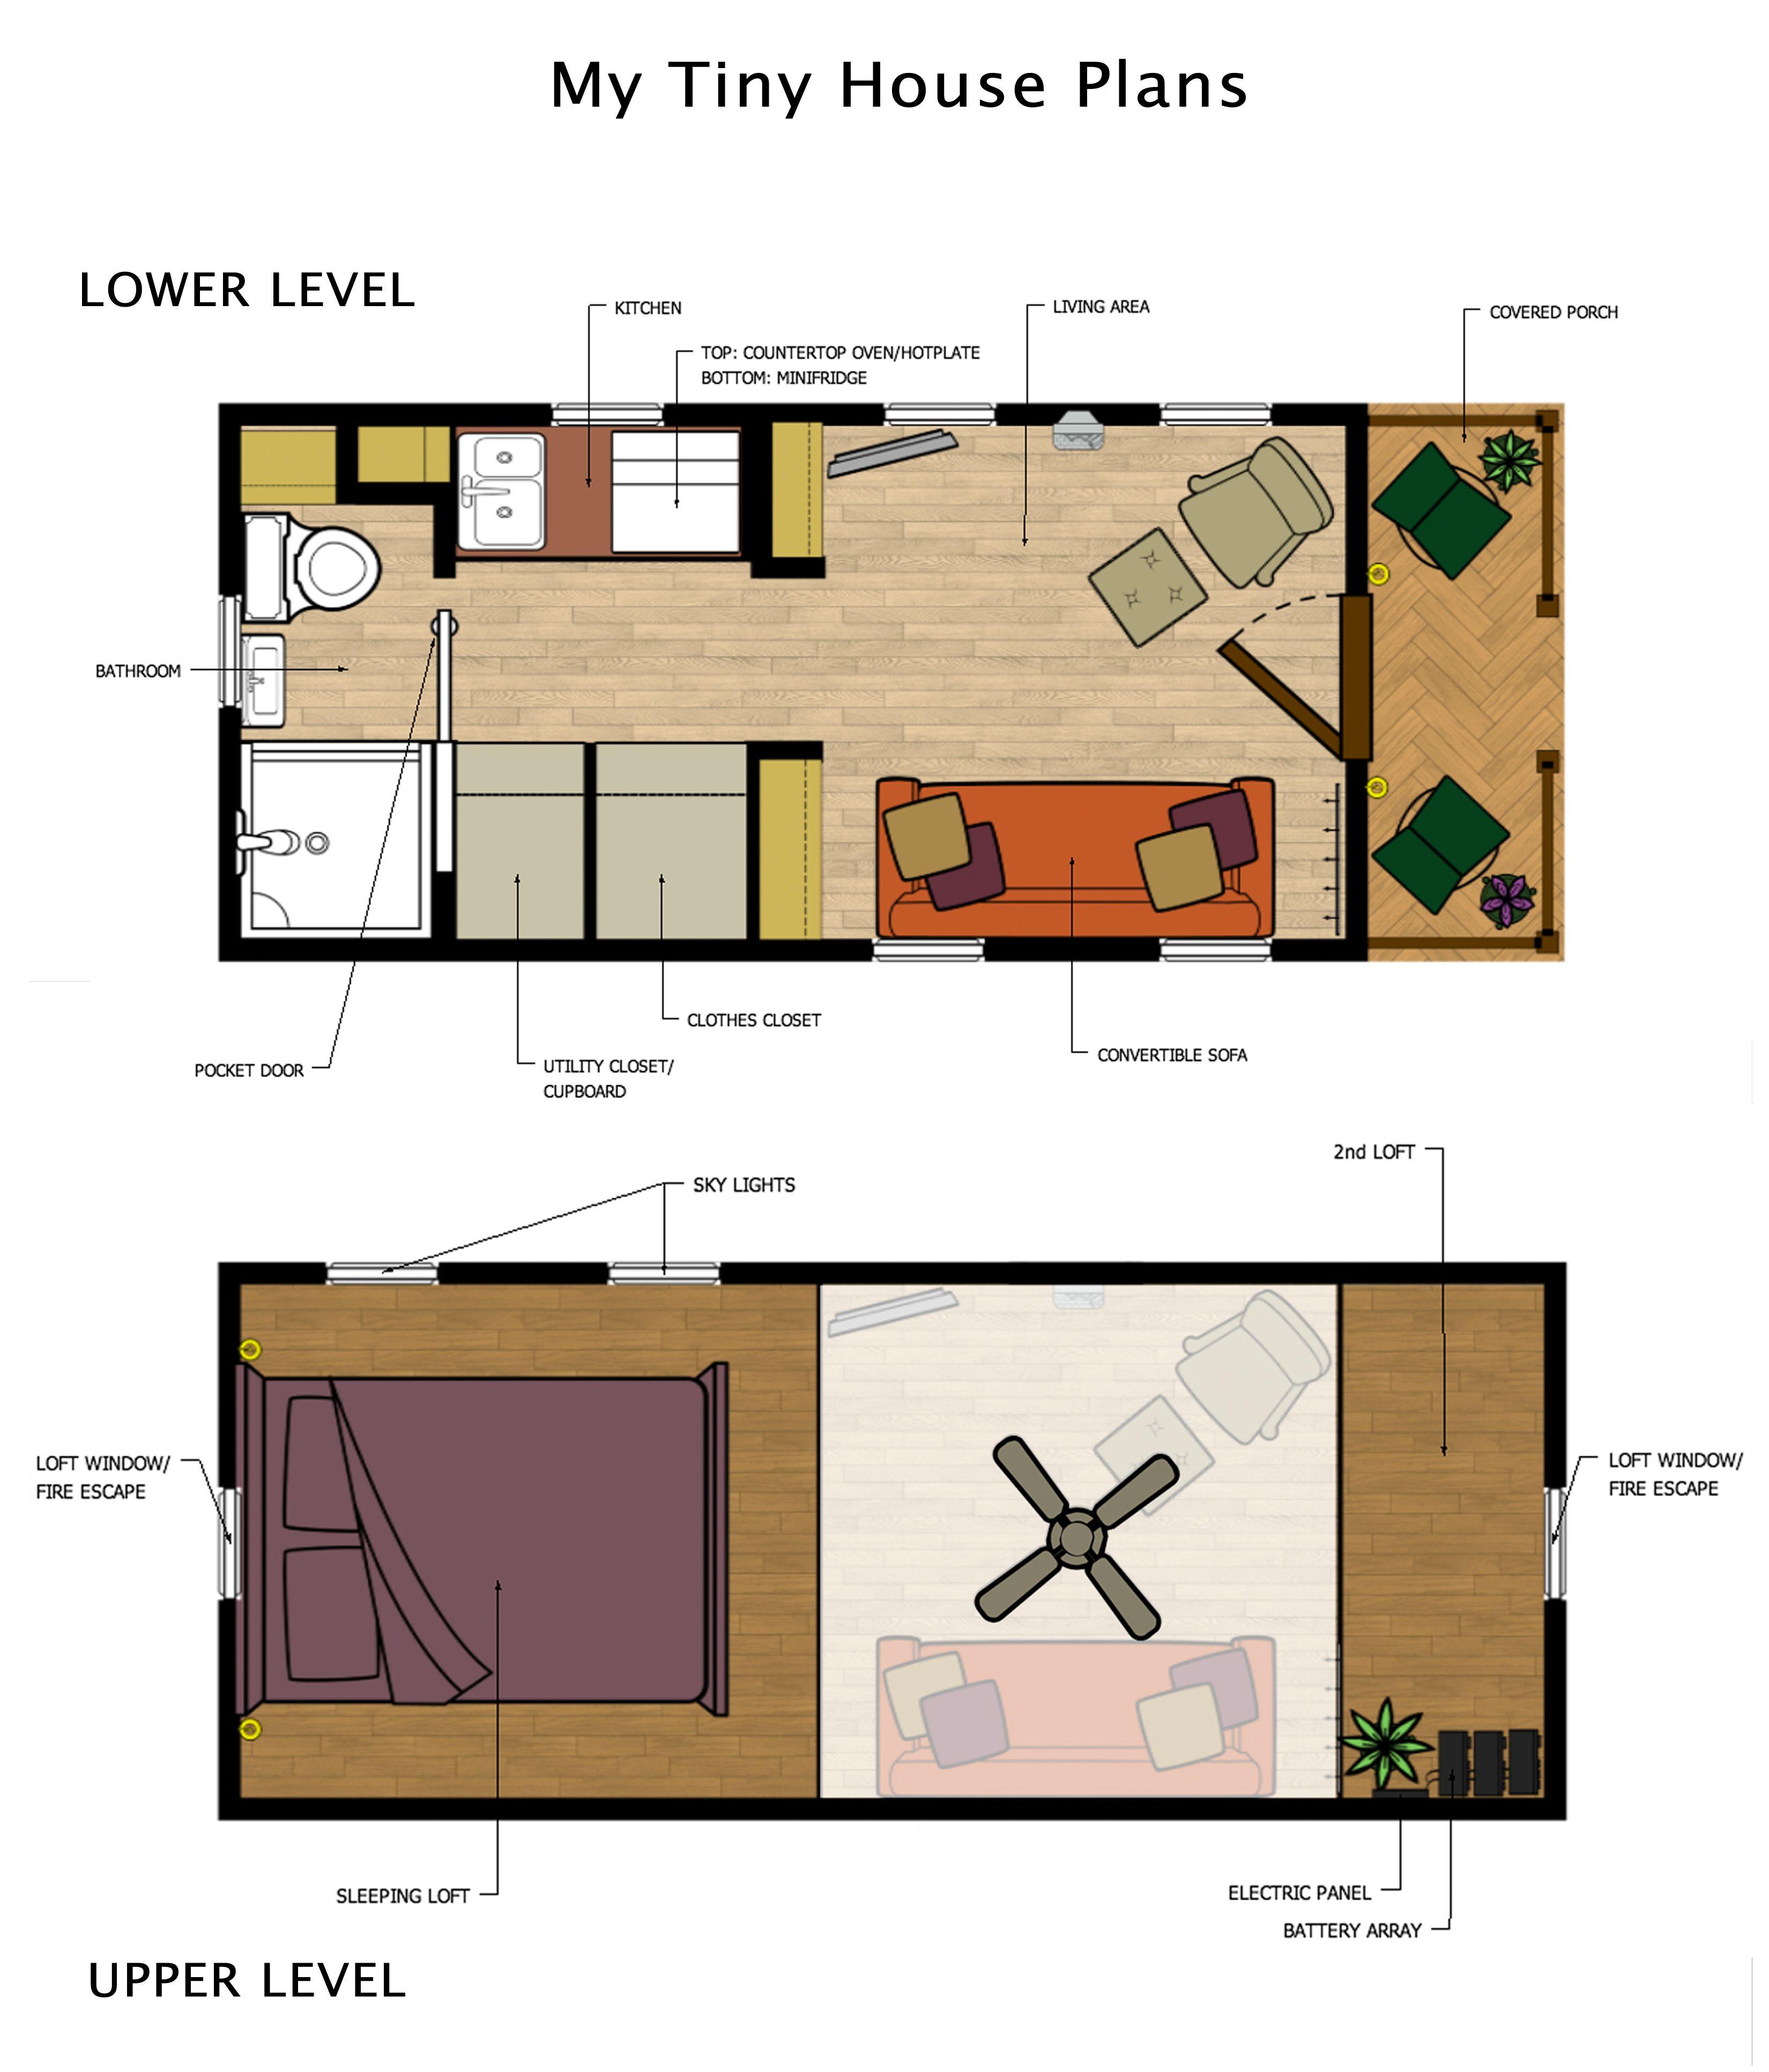 Tiny House Plans Tiny House Plans House Floor Plans